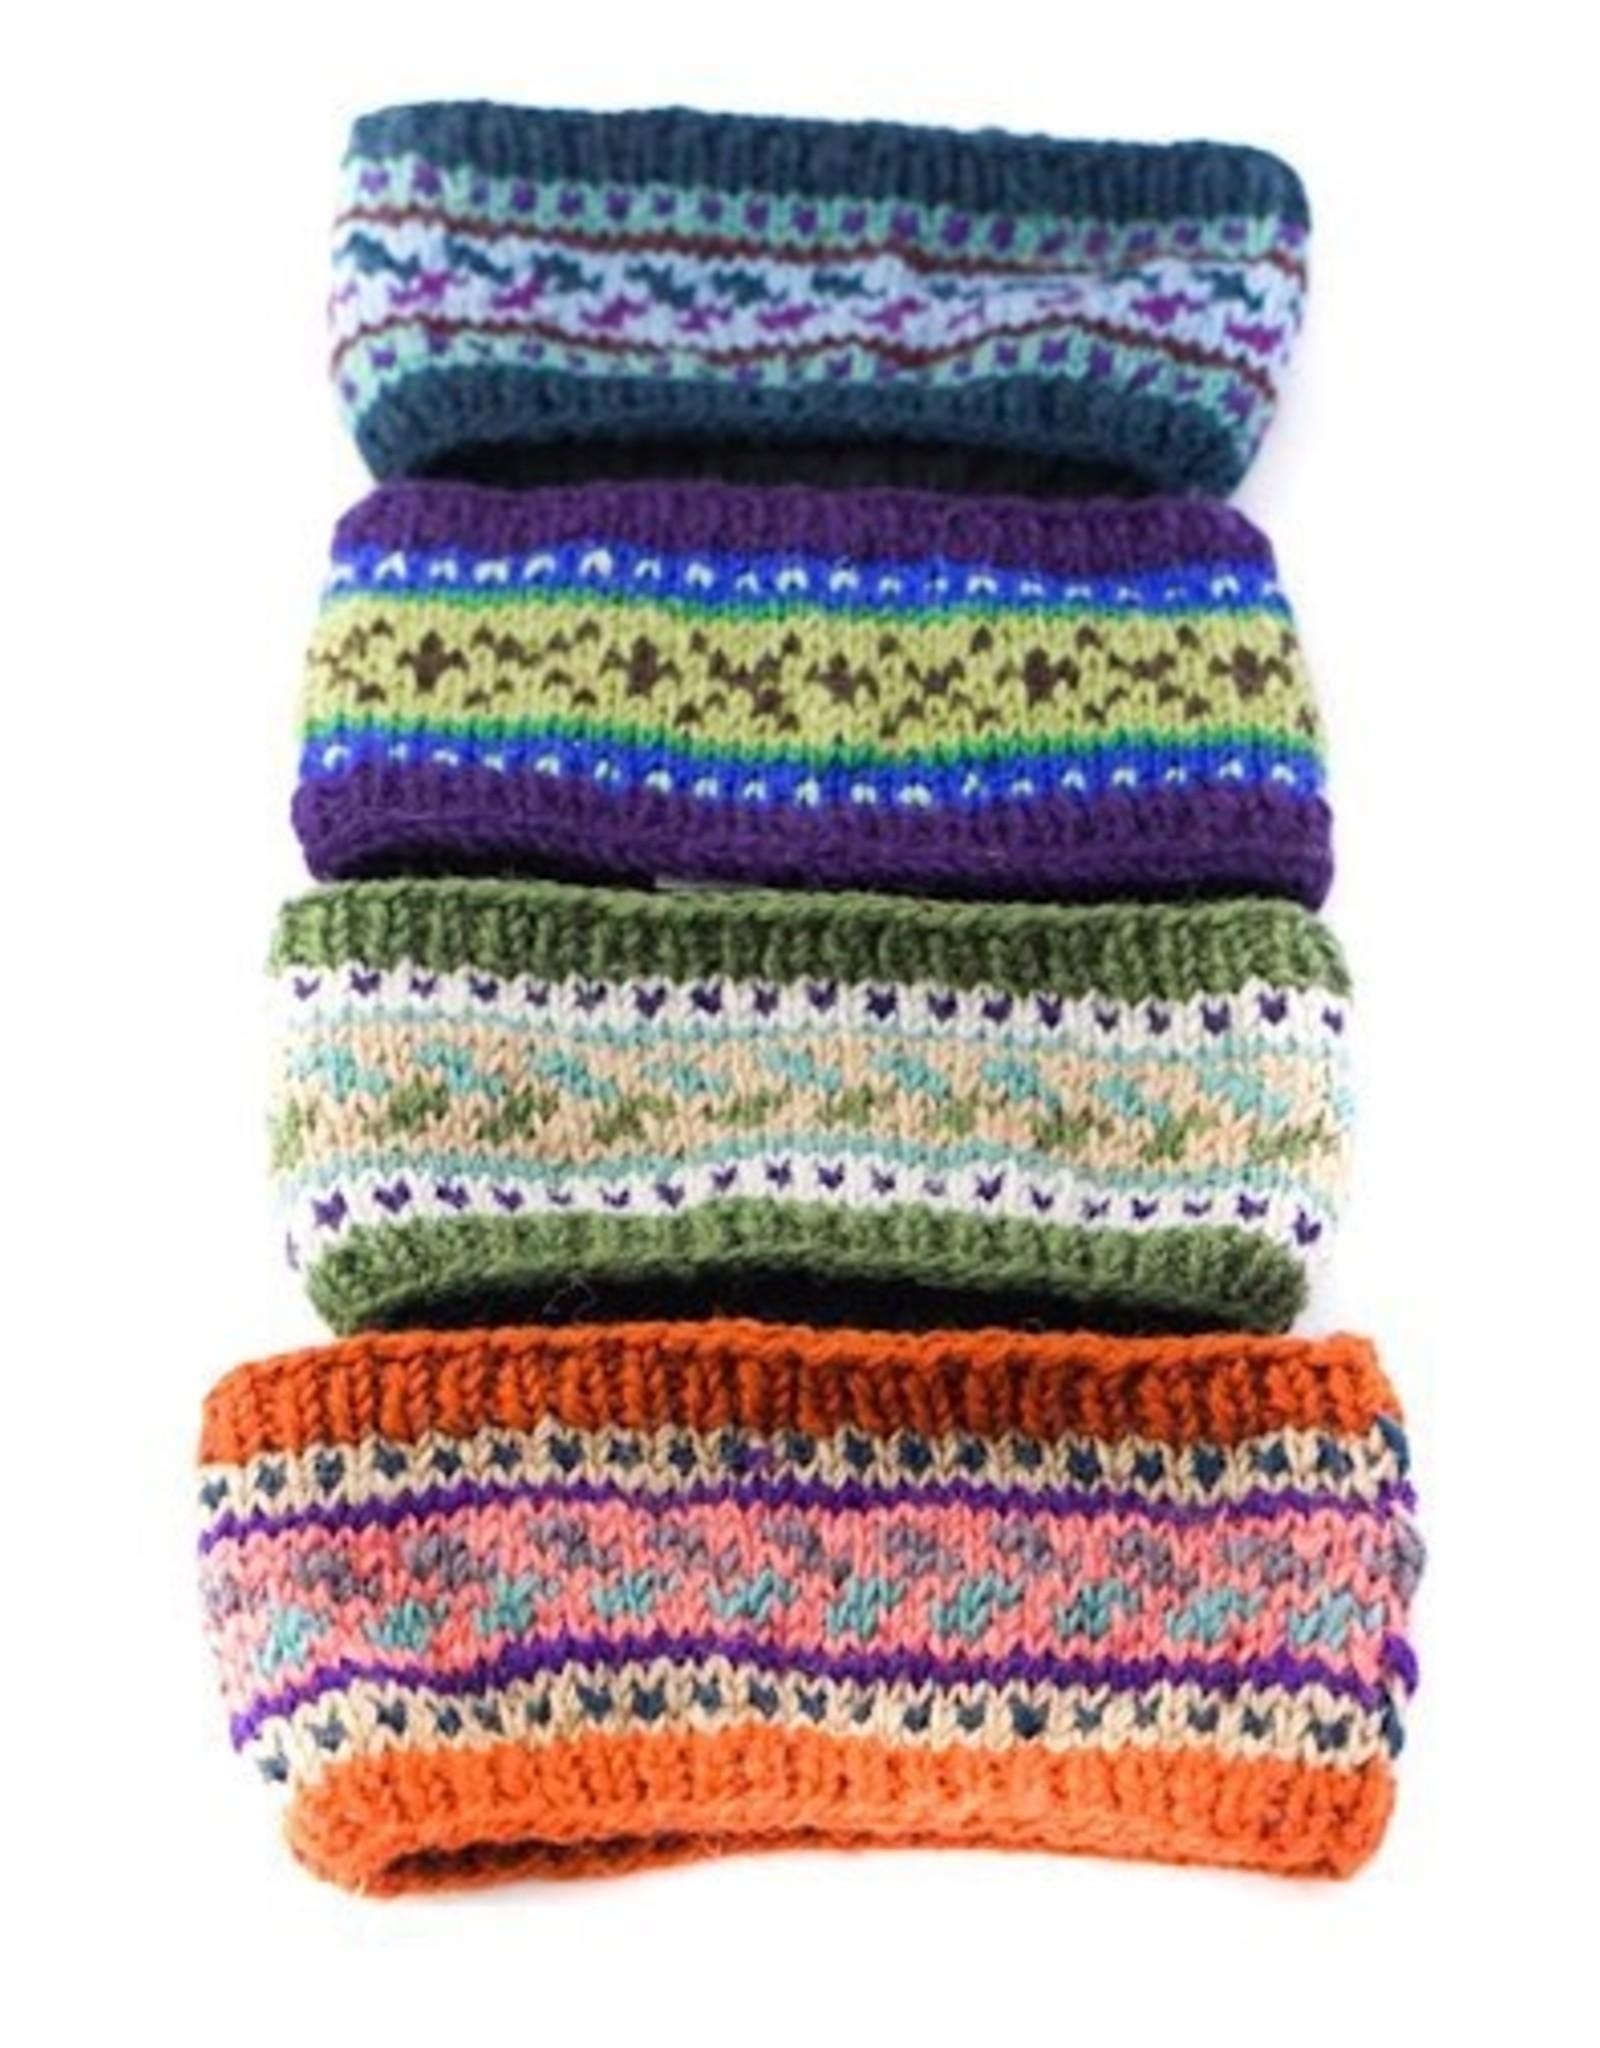 Ganesh Himal Patterned Knit Headband, assorted. Nepal